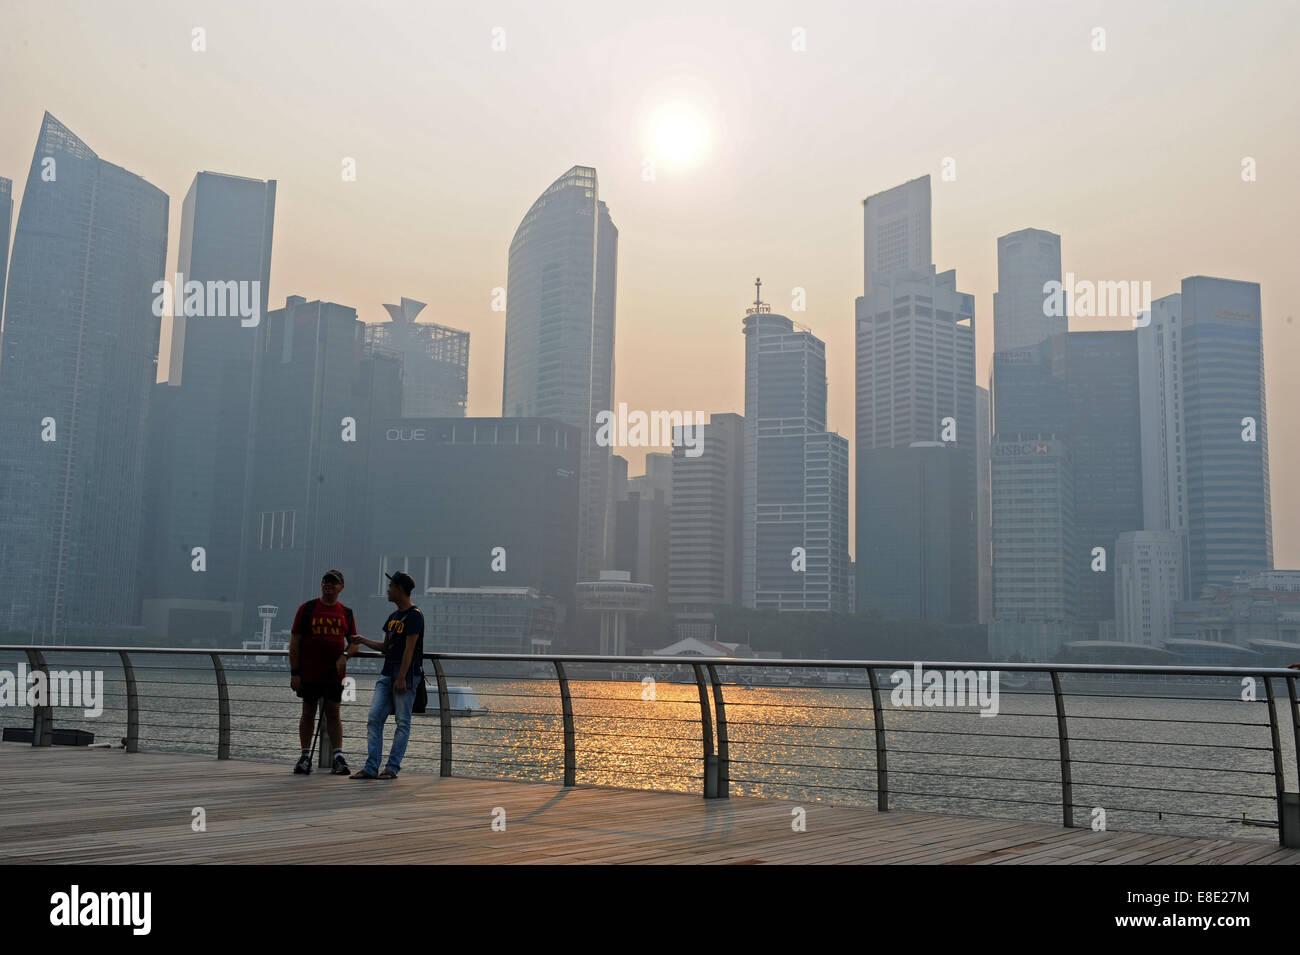 (141006) -- SINGAPORE, Oct. 6, 2014 (Xinhua) -- Buildings are enveloped in haze in Singapore, Oct. 6, 2014. Singapore's - Stock Image